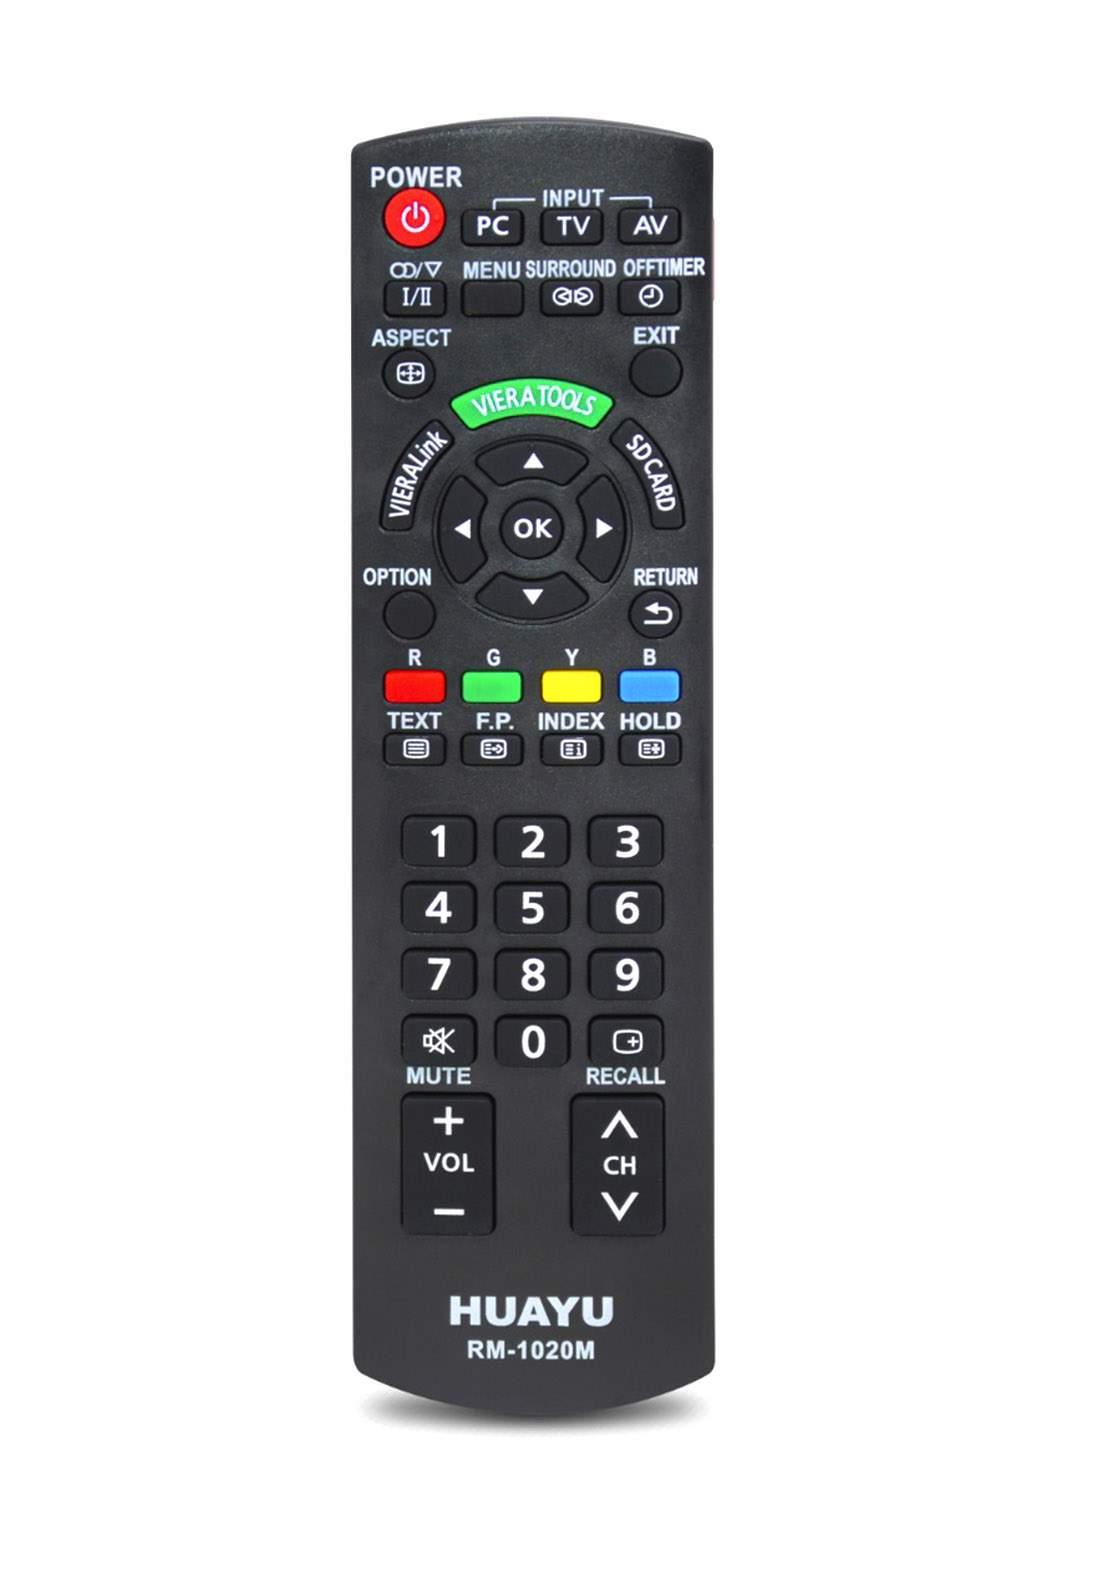 HUAYU Remote Control For Sony TV - Black جهاز التحكم عن بعد